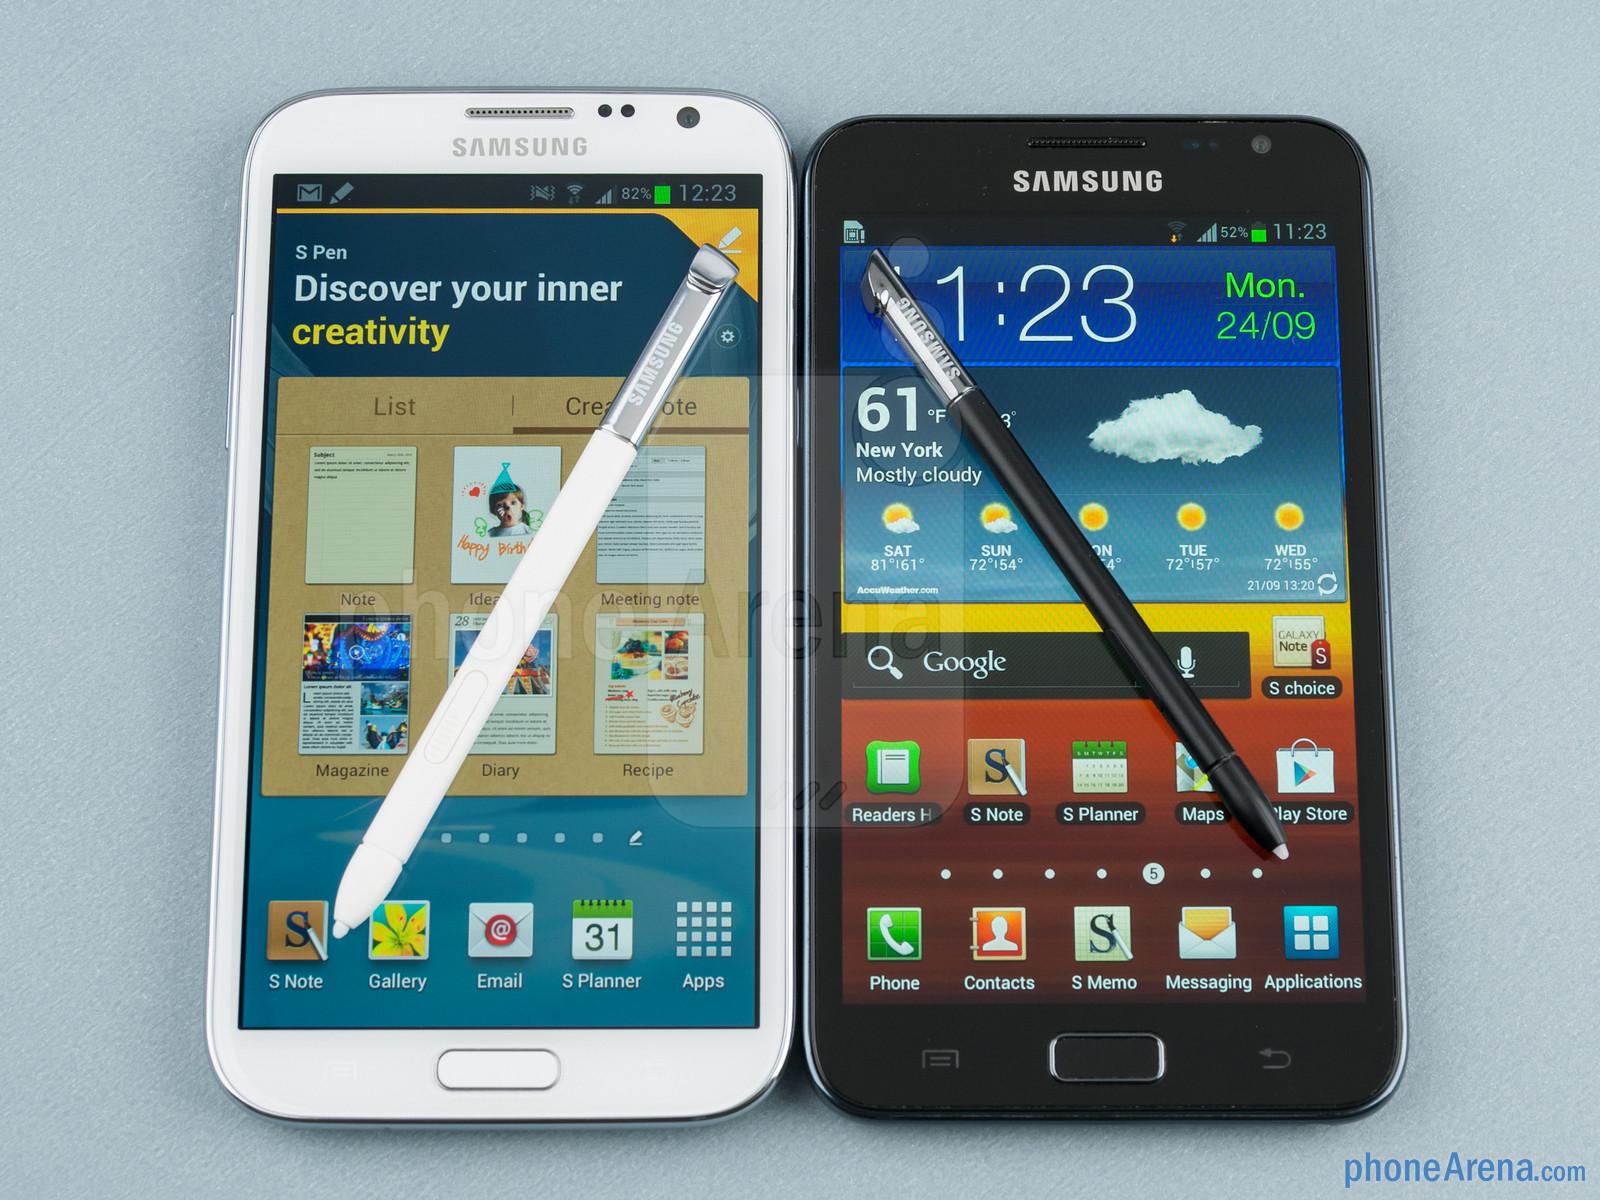 onestop: Samsung galaxy note unlocking and samsung galaxy